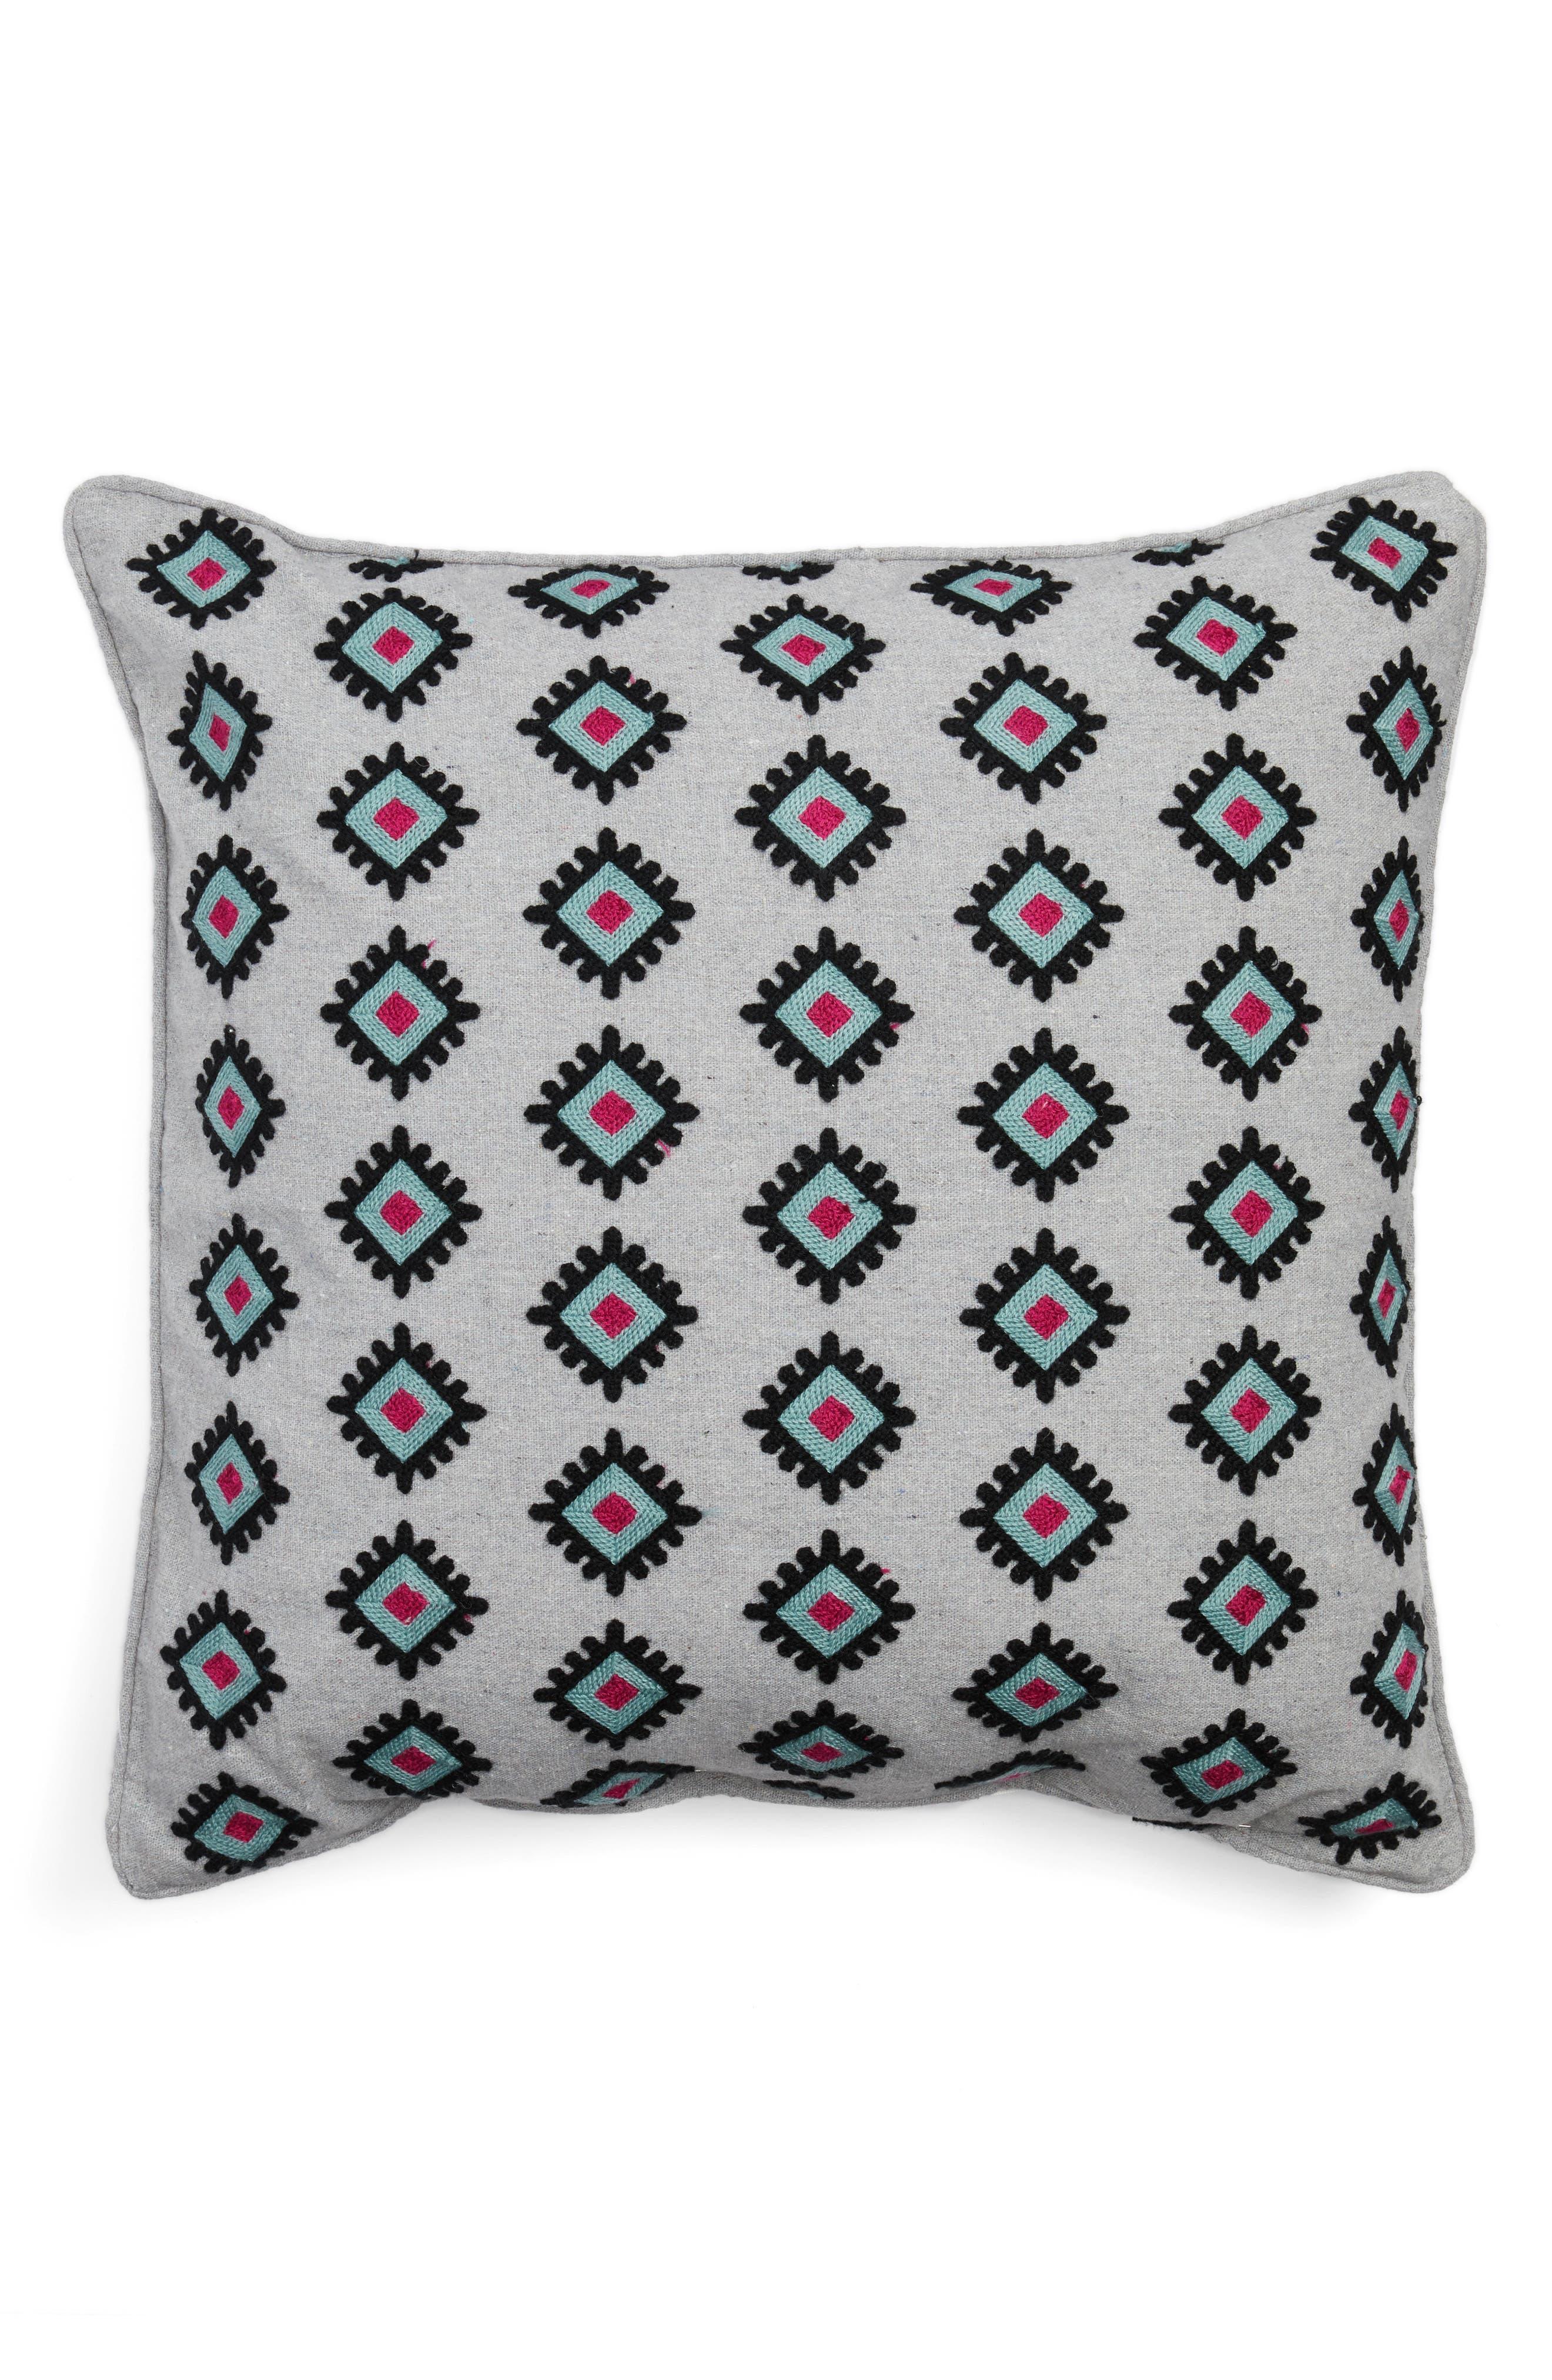 Nala Towel Stitch Accent Pillow,                             Main thumbnail 1, color,